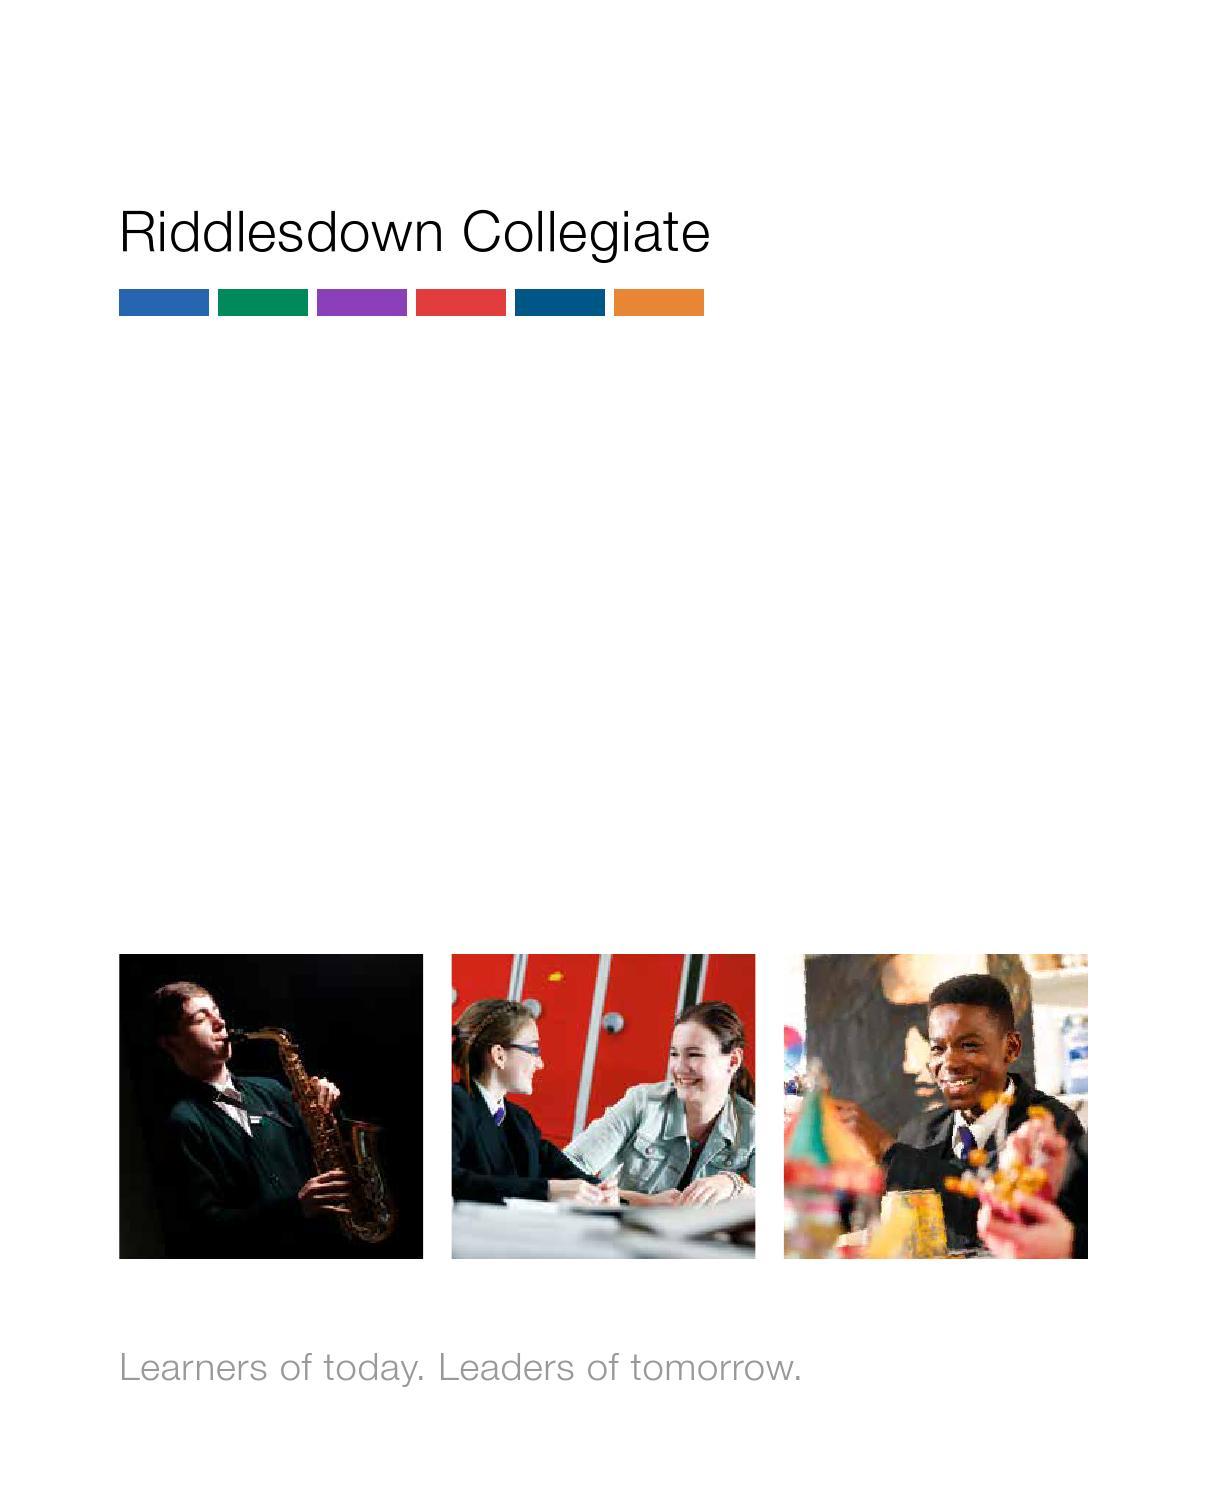 riddlesdown collegiate homework